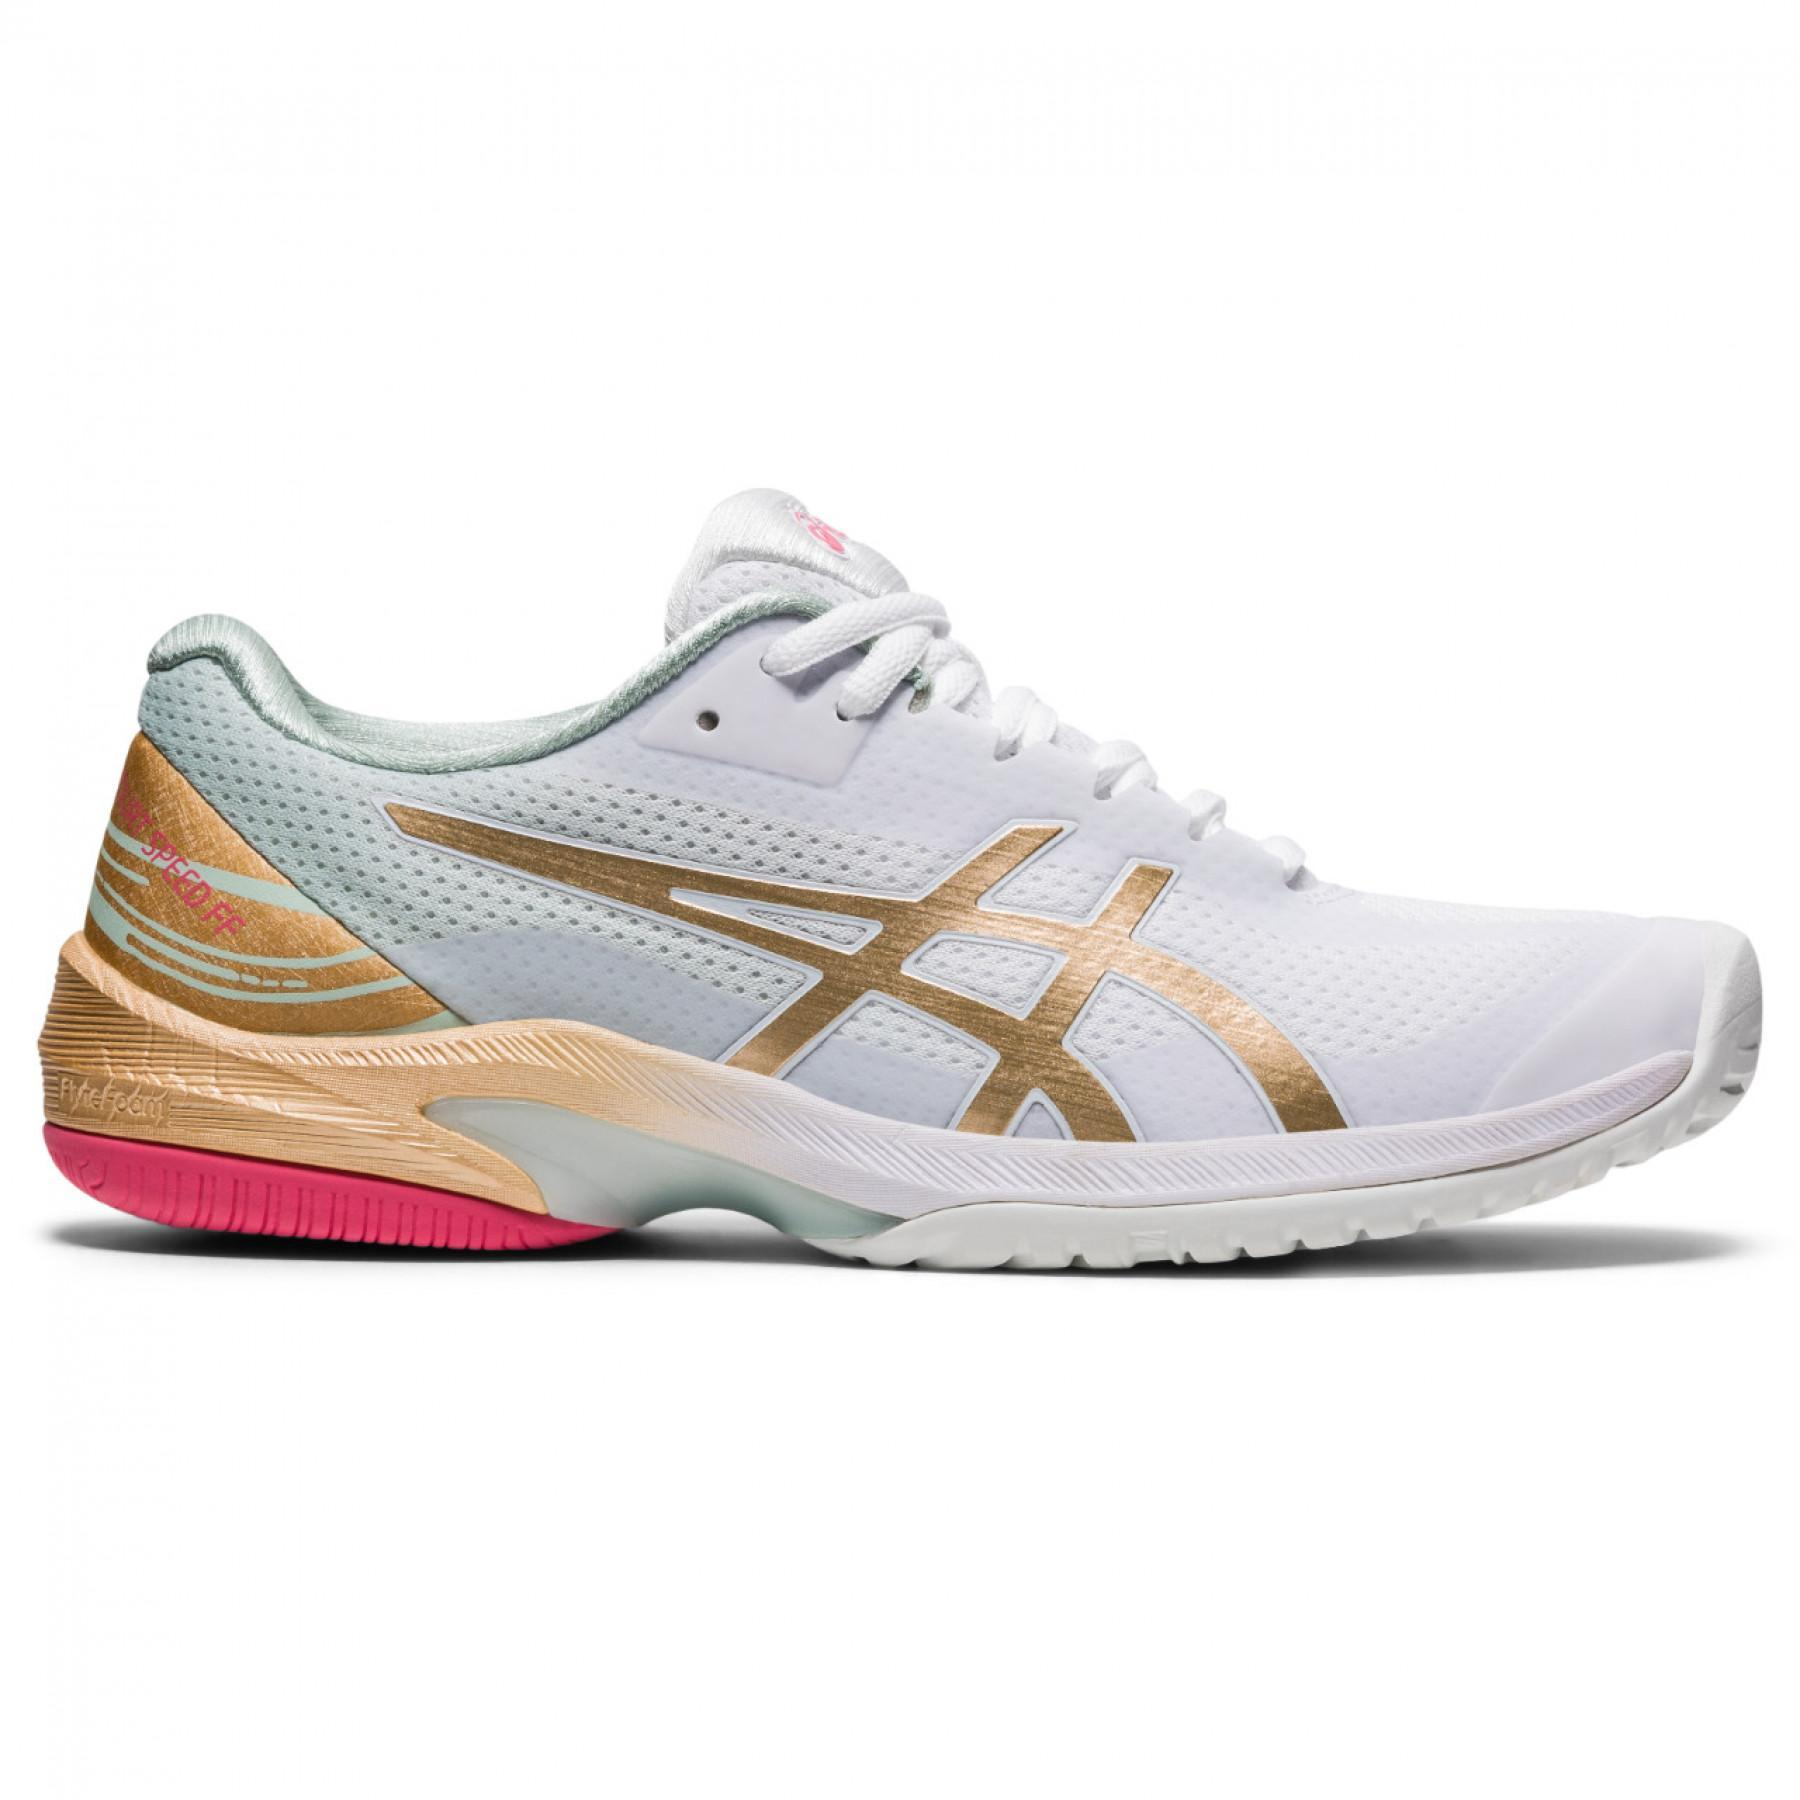 Women's shoes Asics Court Speed Ff L.e.